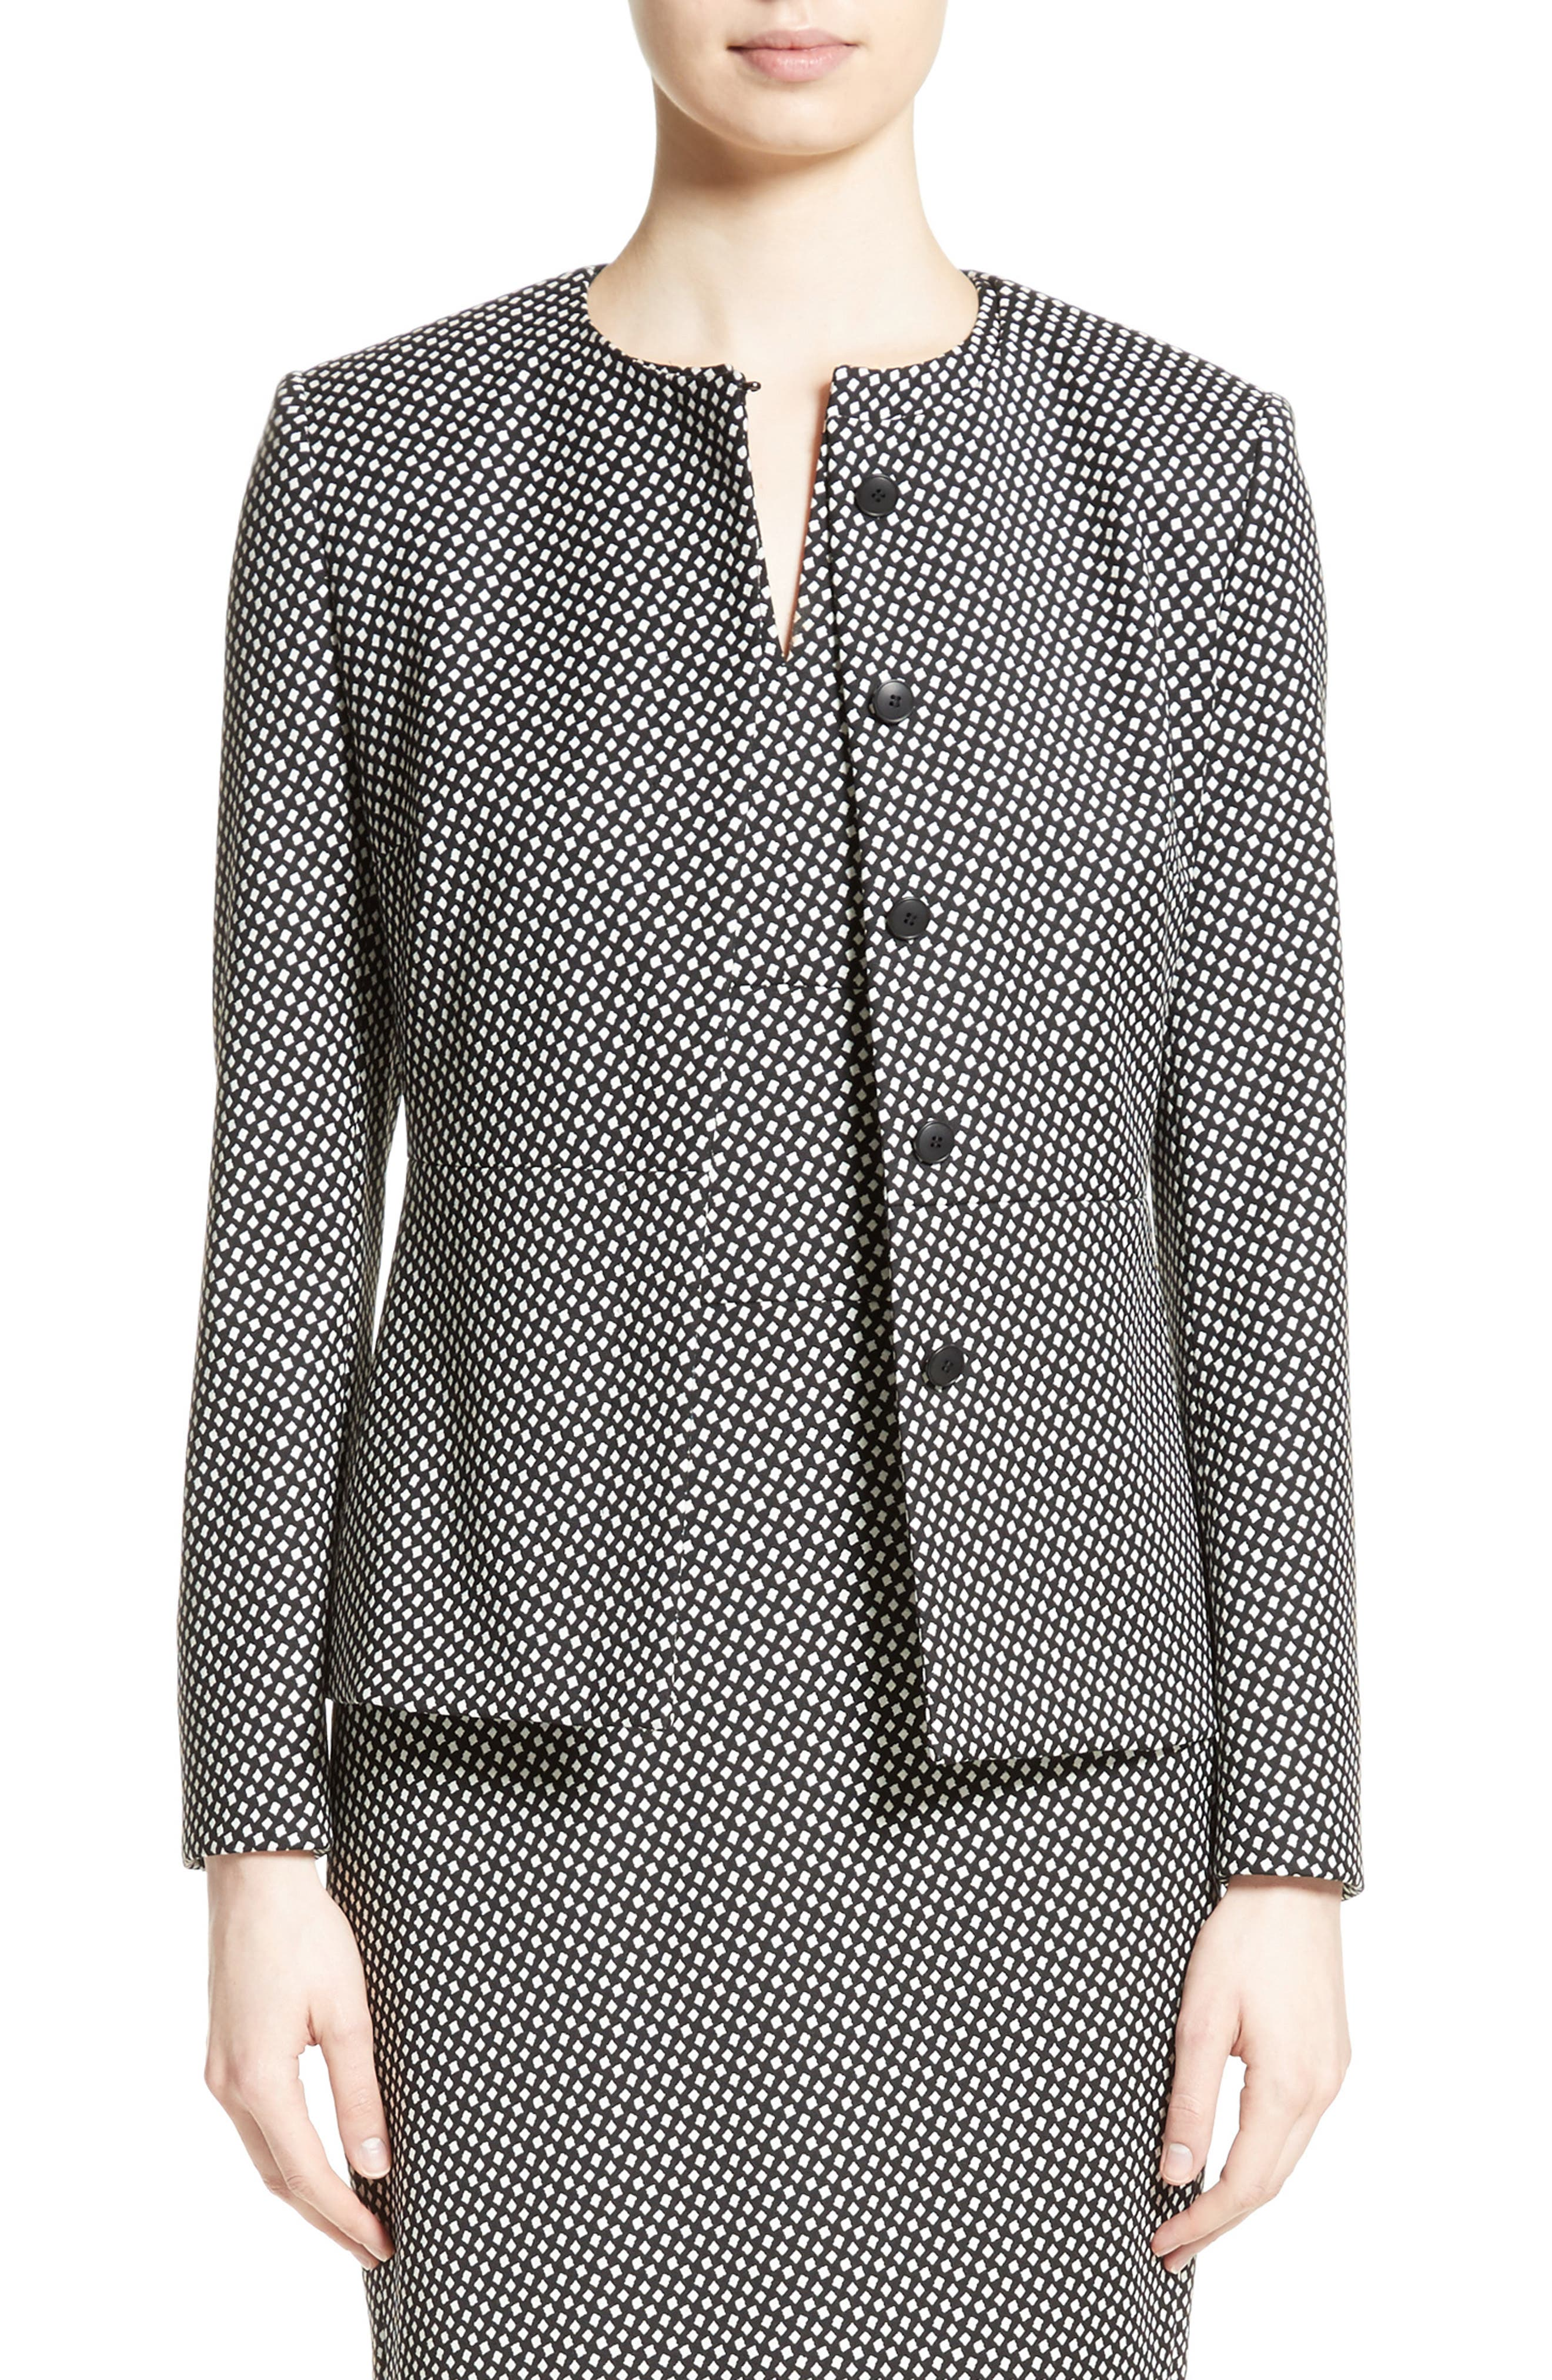 Ajaccio Wool Blend Jacquard Jacket,                         Main,                         color, Black